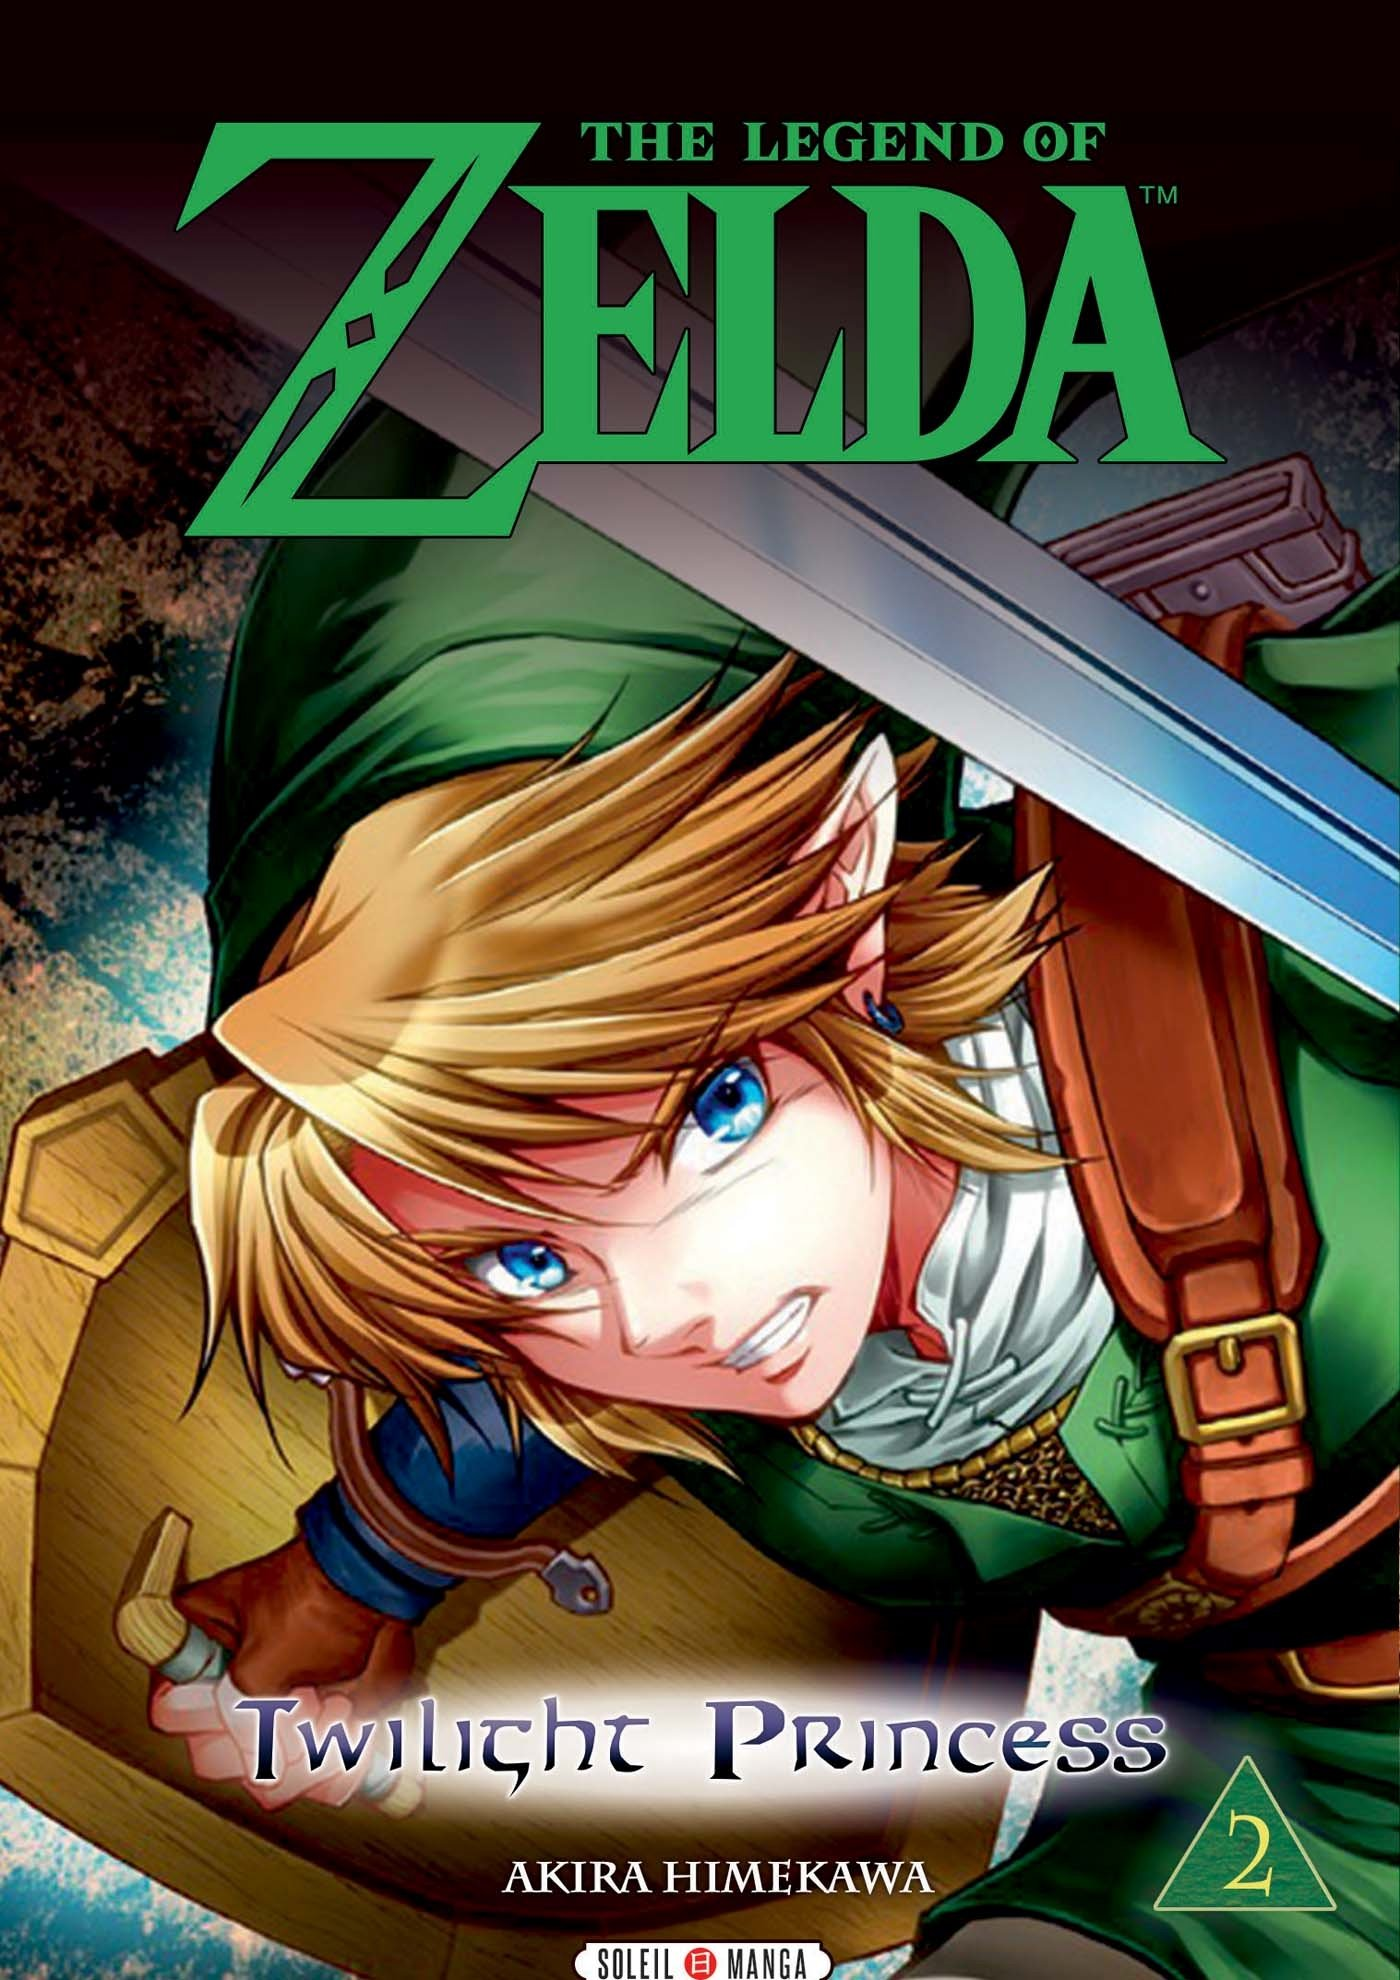 The Legend of Zelda - Twilight Princess 2